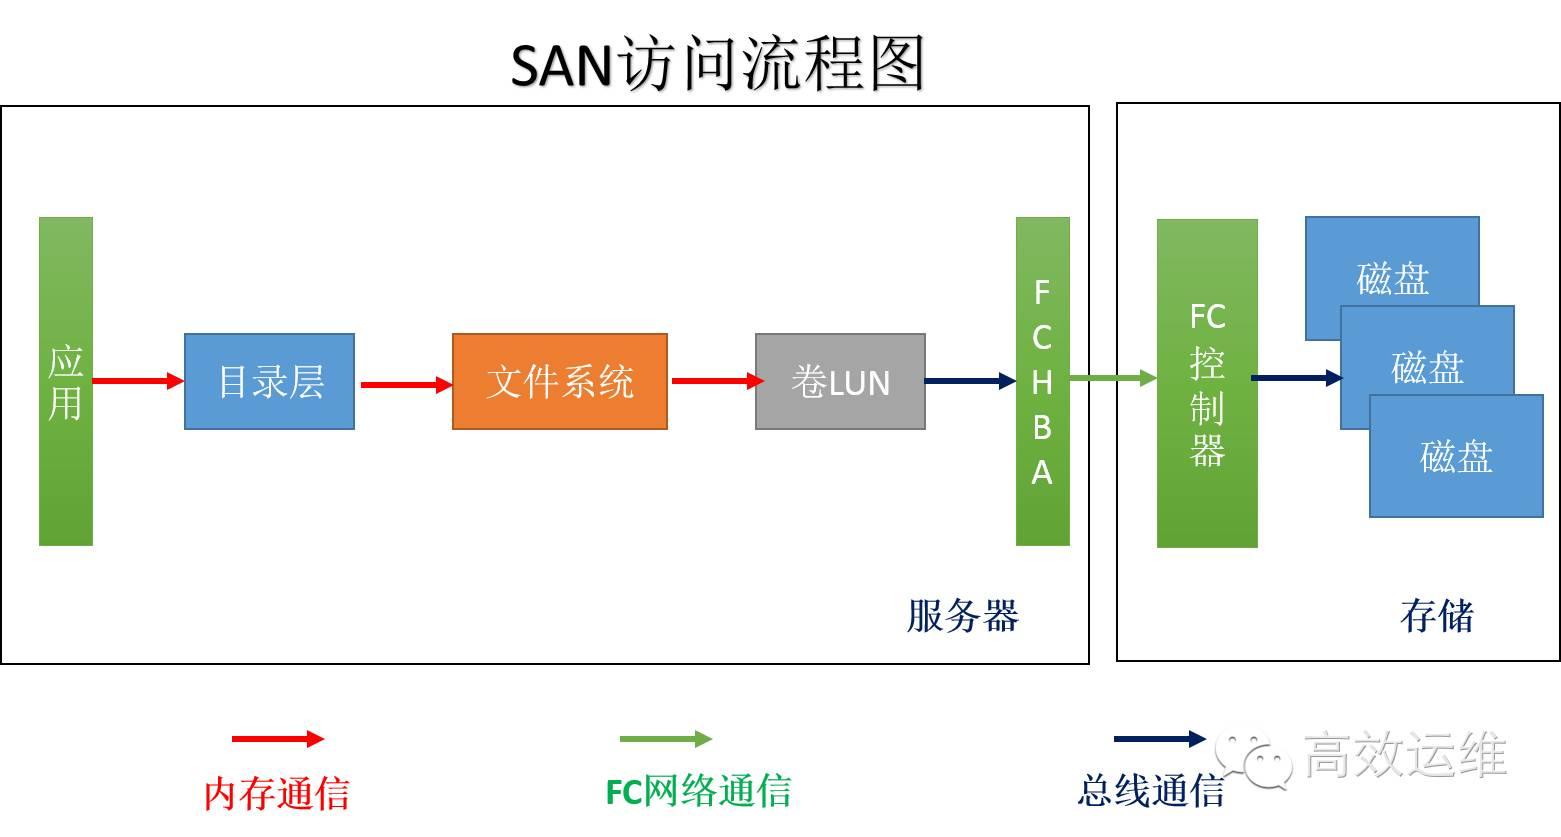 SAN访问流程图